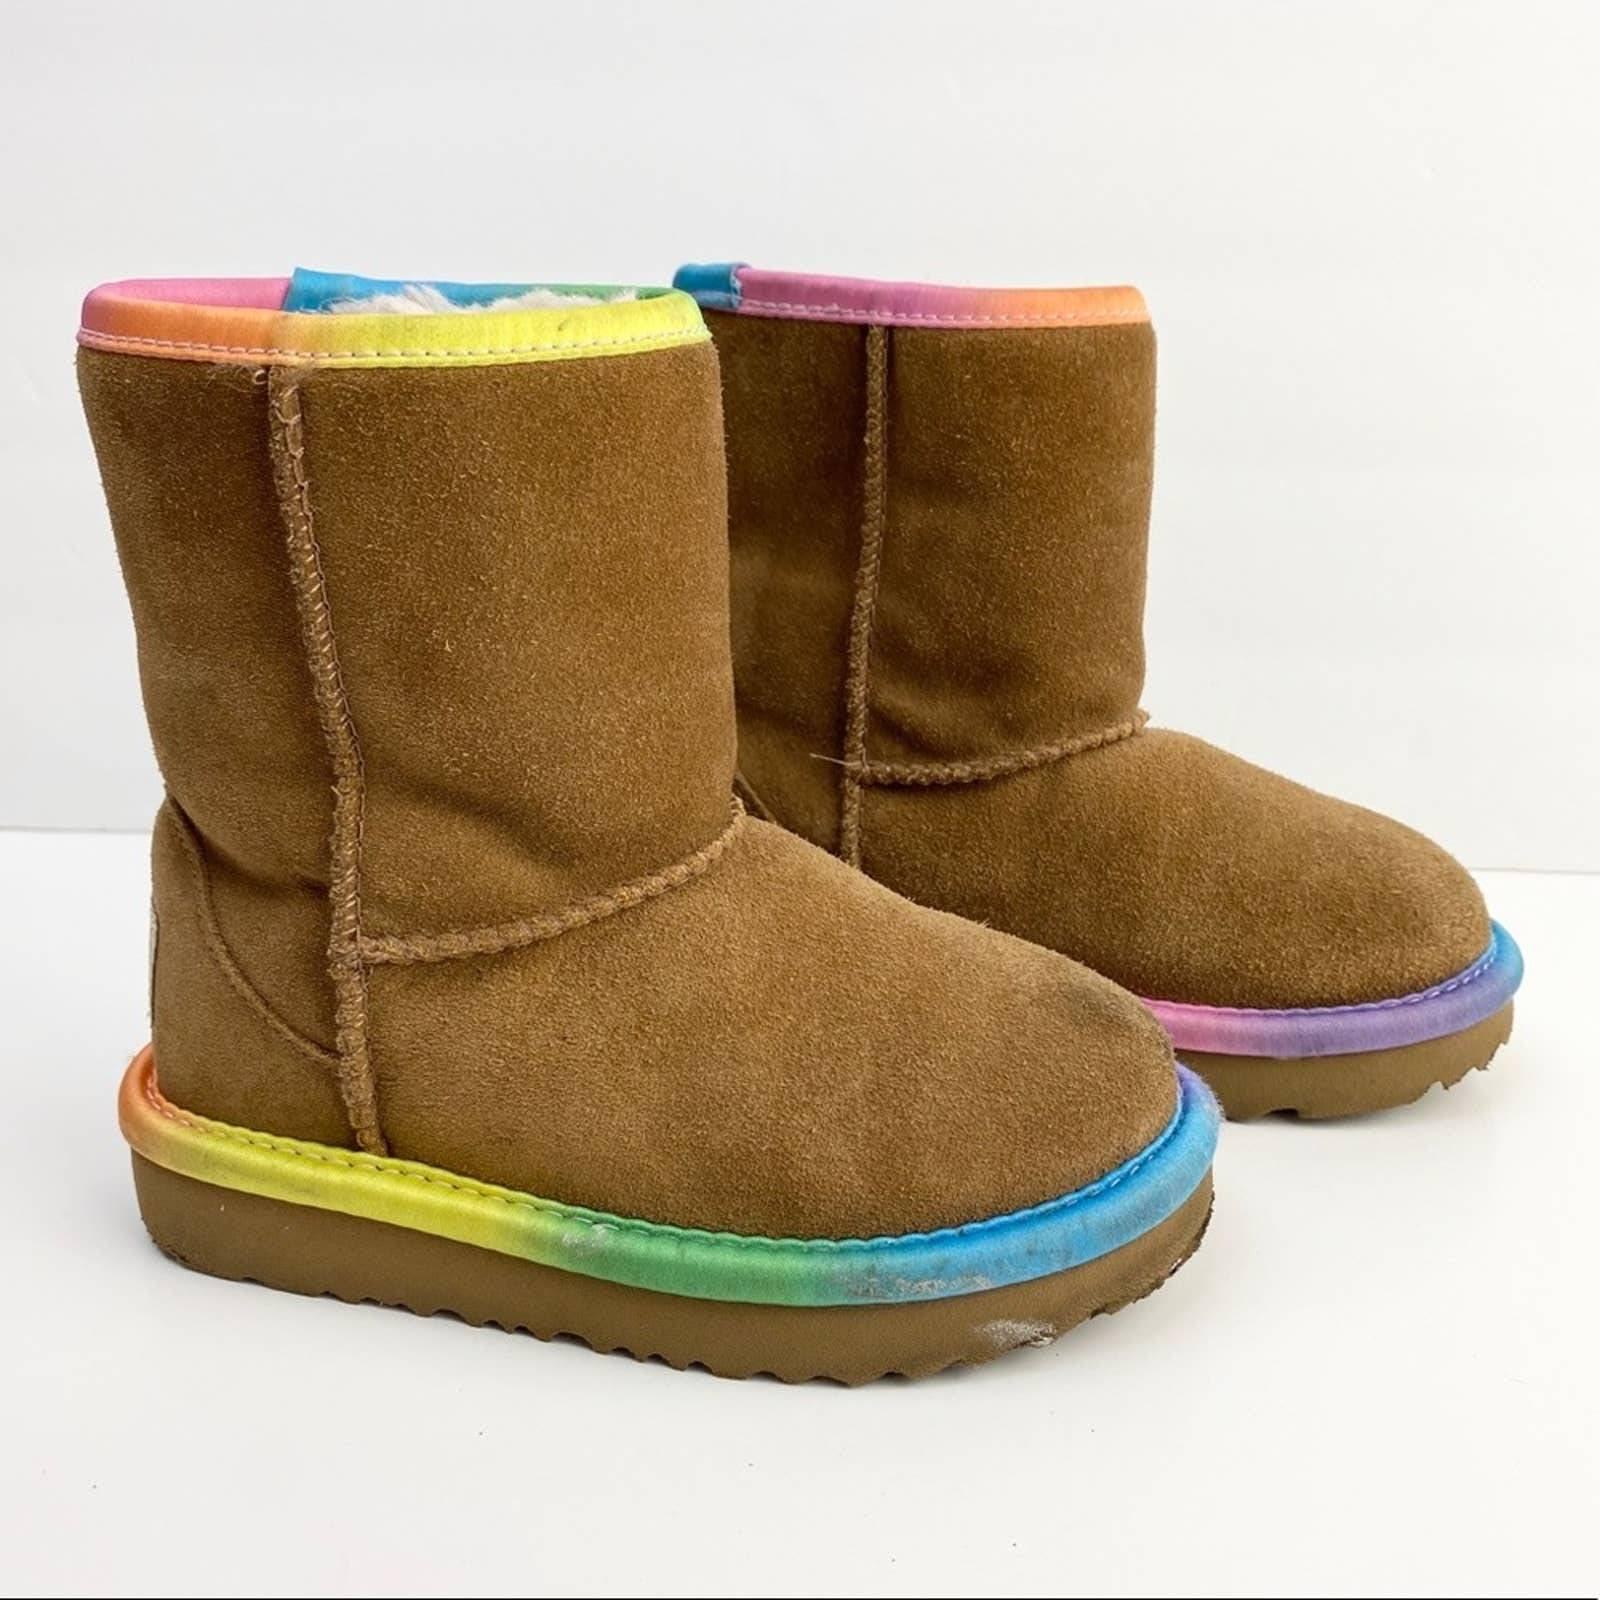 Ugg Short II Rainbow Boots Toddler 8